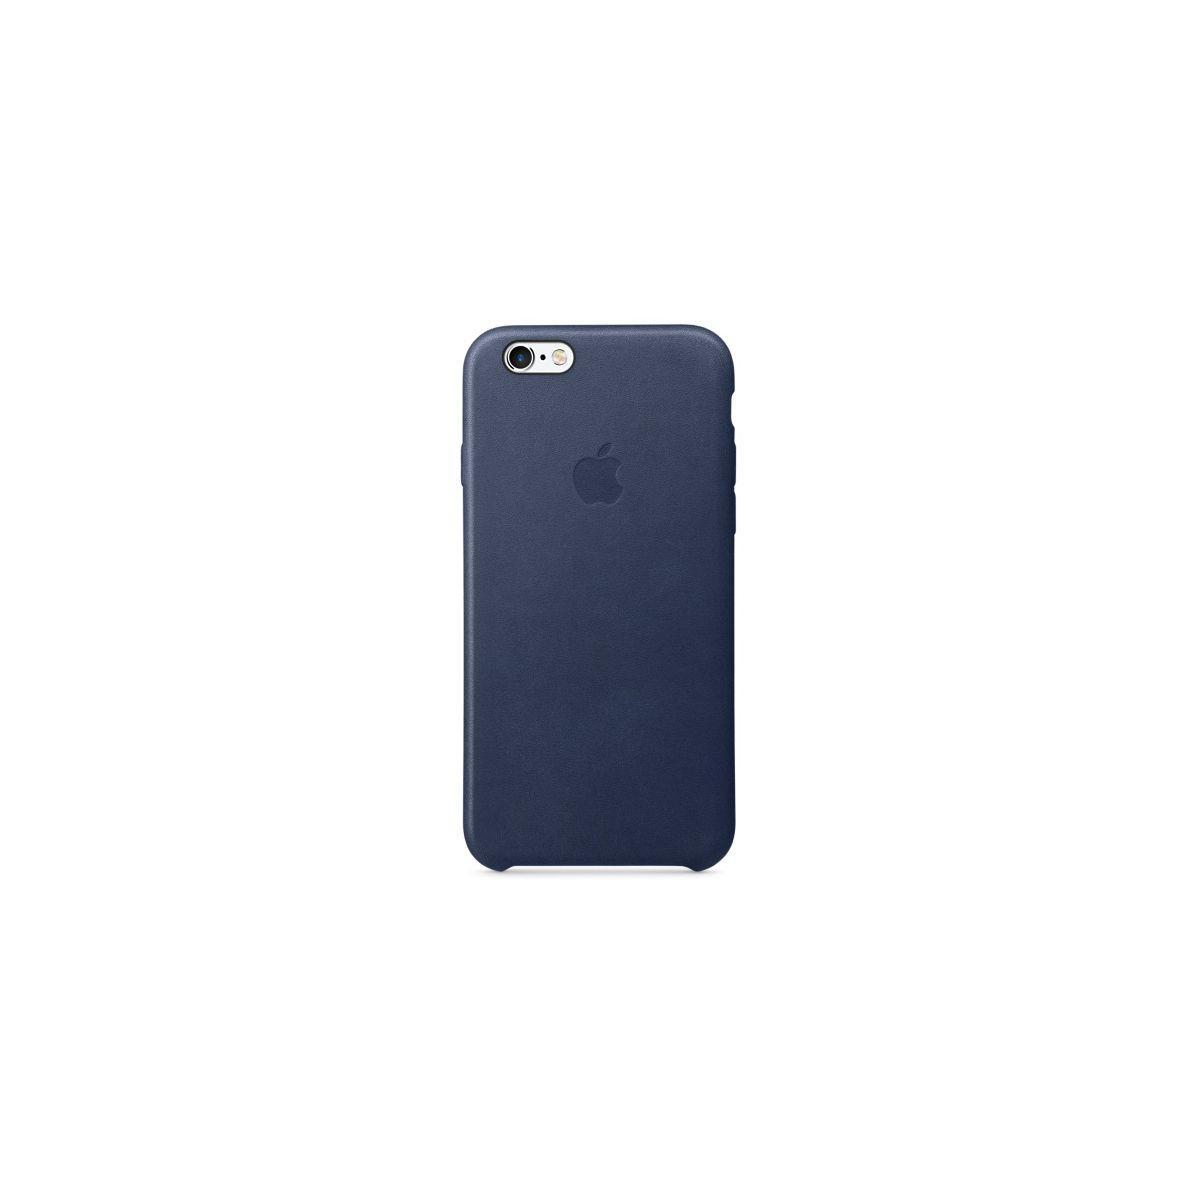 Coque apple iphone 6/6s cuir bleu nuit (photo)